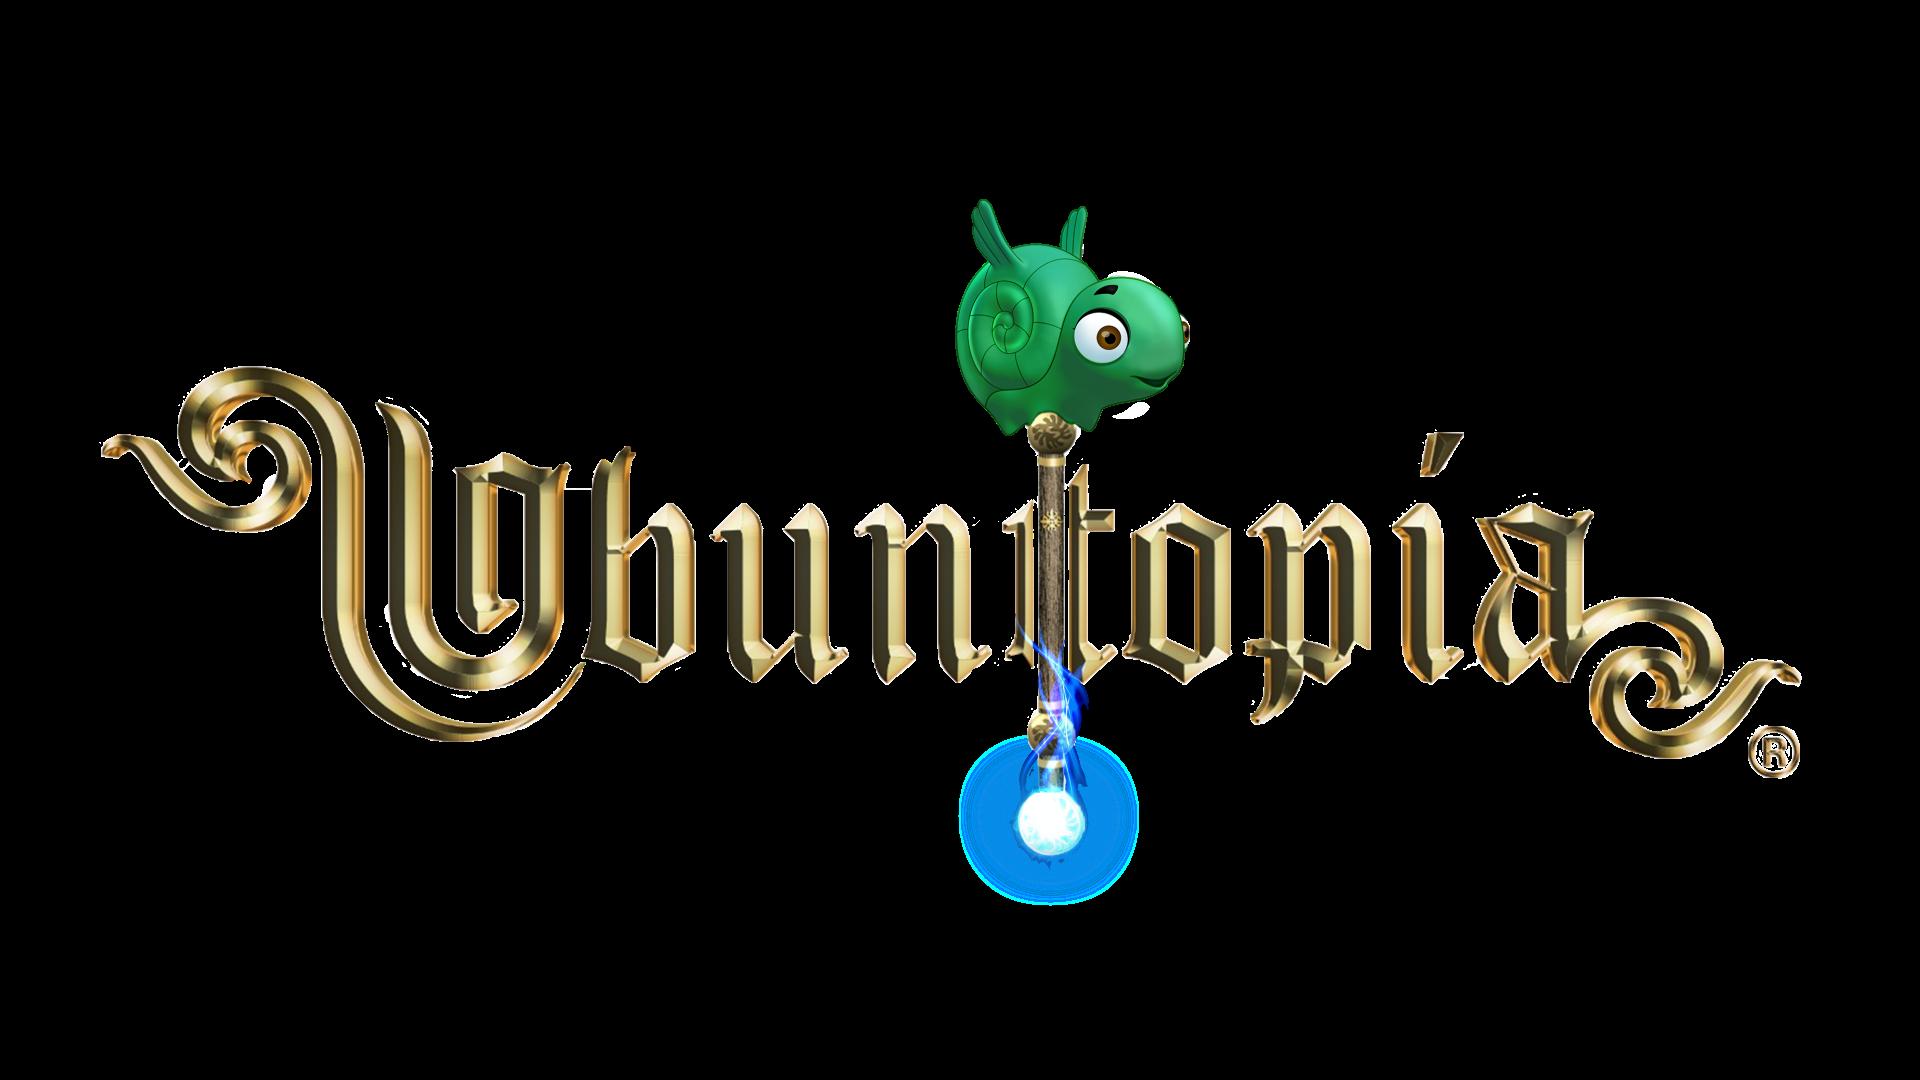 Ubuntopia – Creating Cultural Family Edutainment in a magical way…